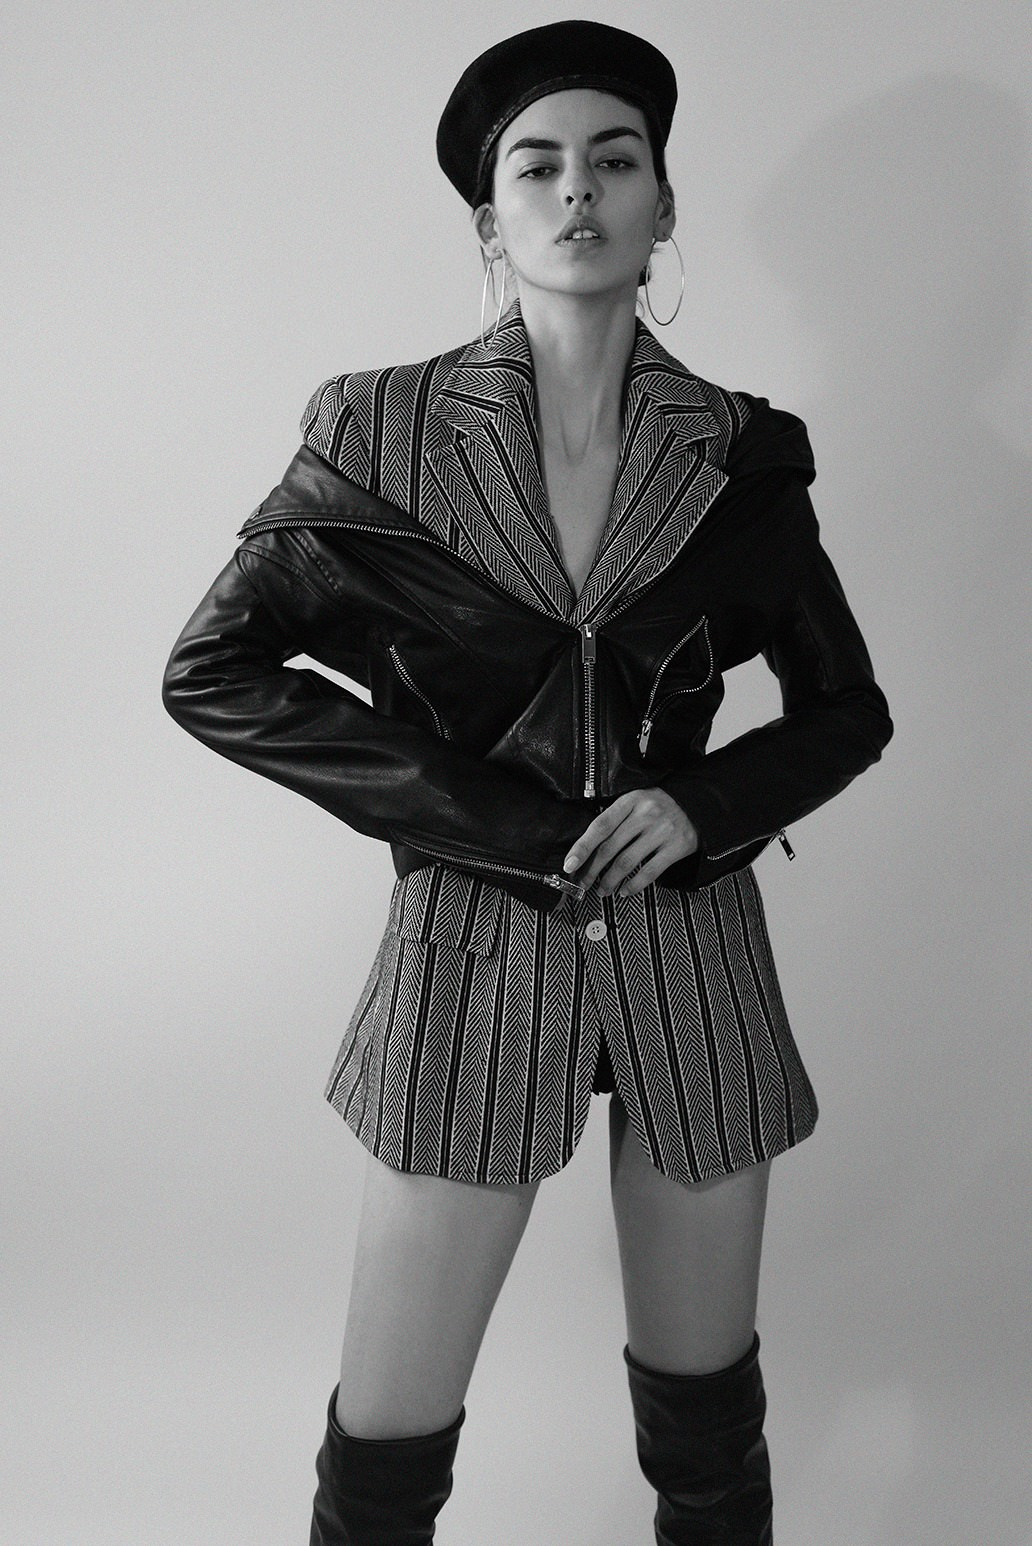 elizabeth de alba, top 15 de top model of the world 2019/2nd runner-up de miss grand mexico 2020. - Página 3 Risoya10